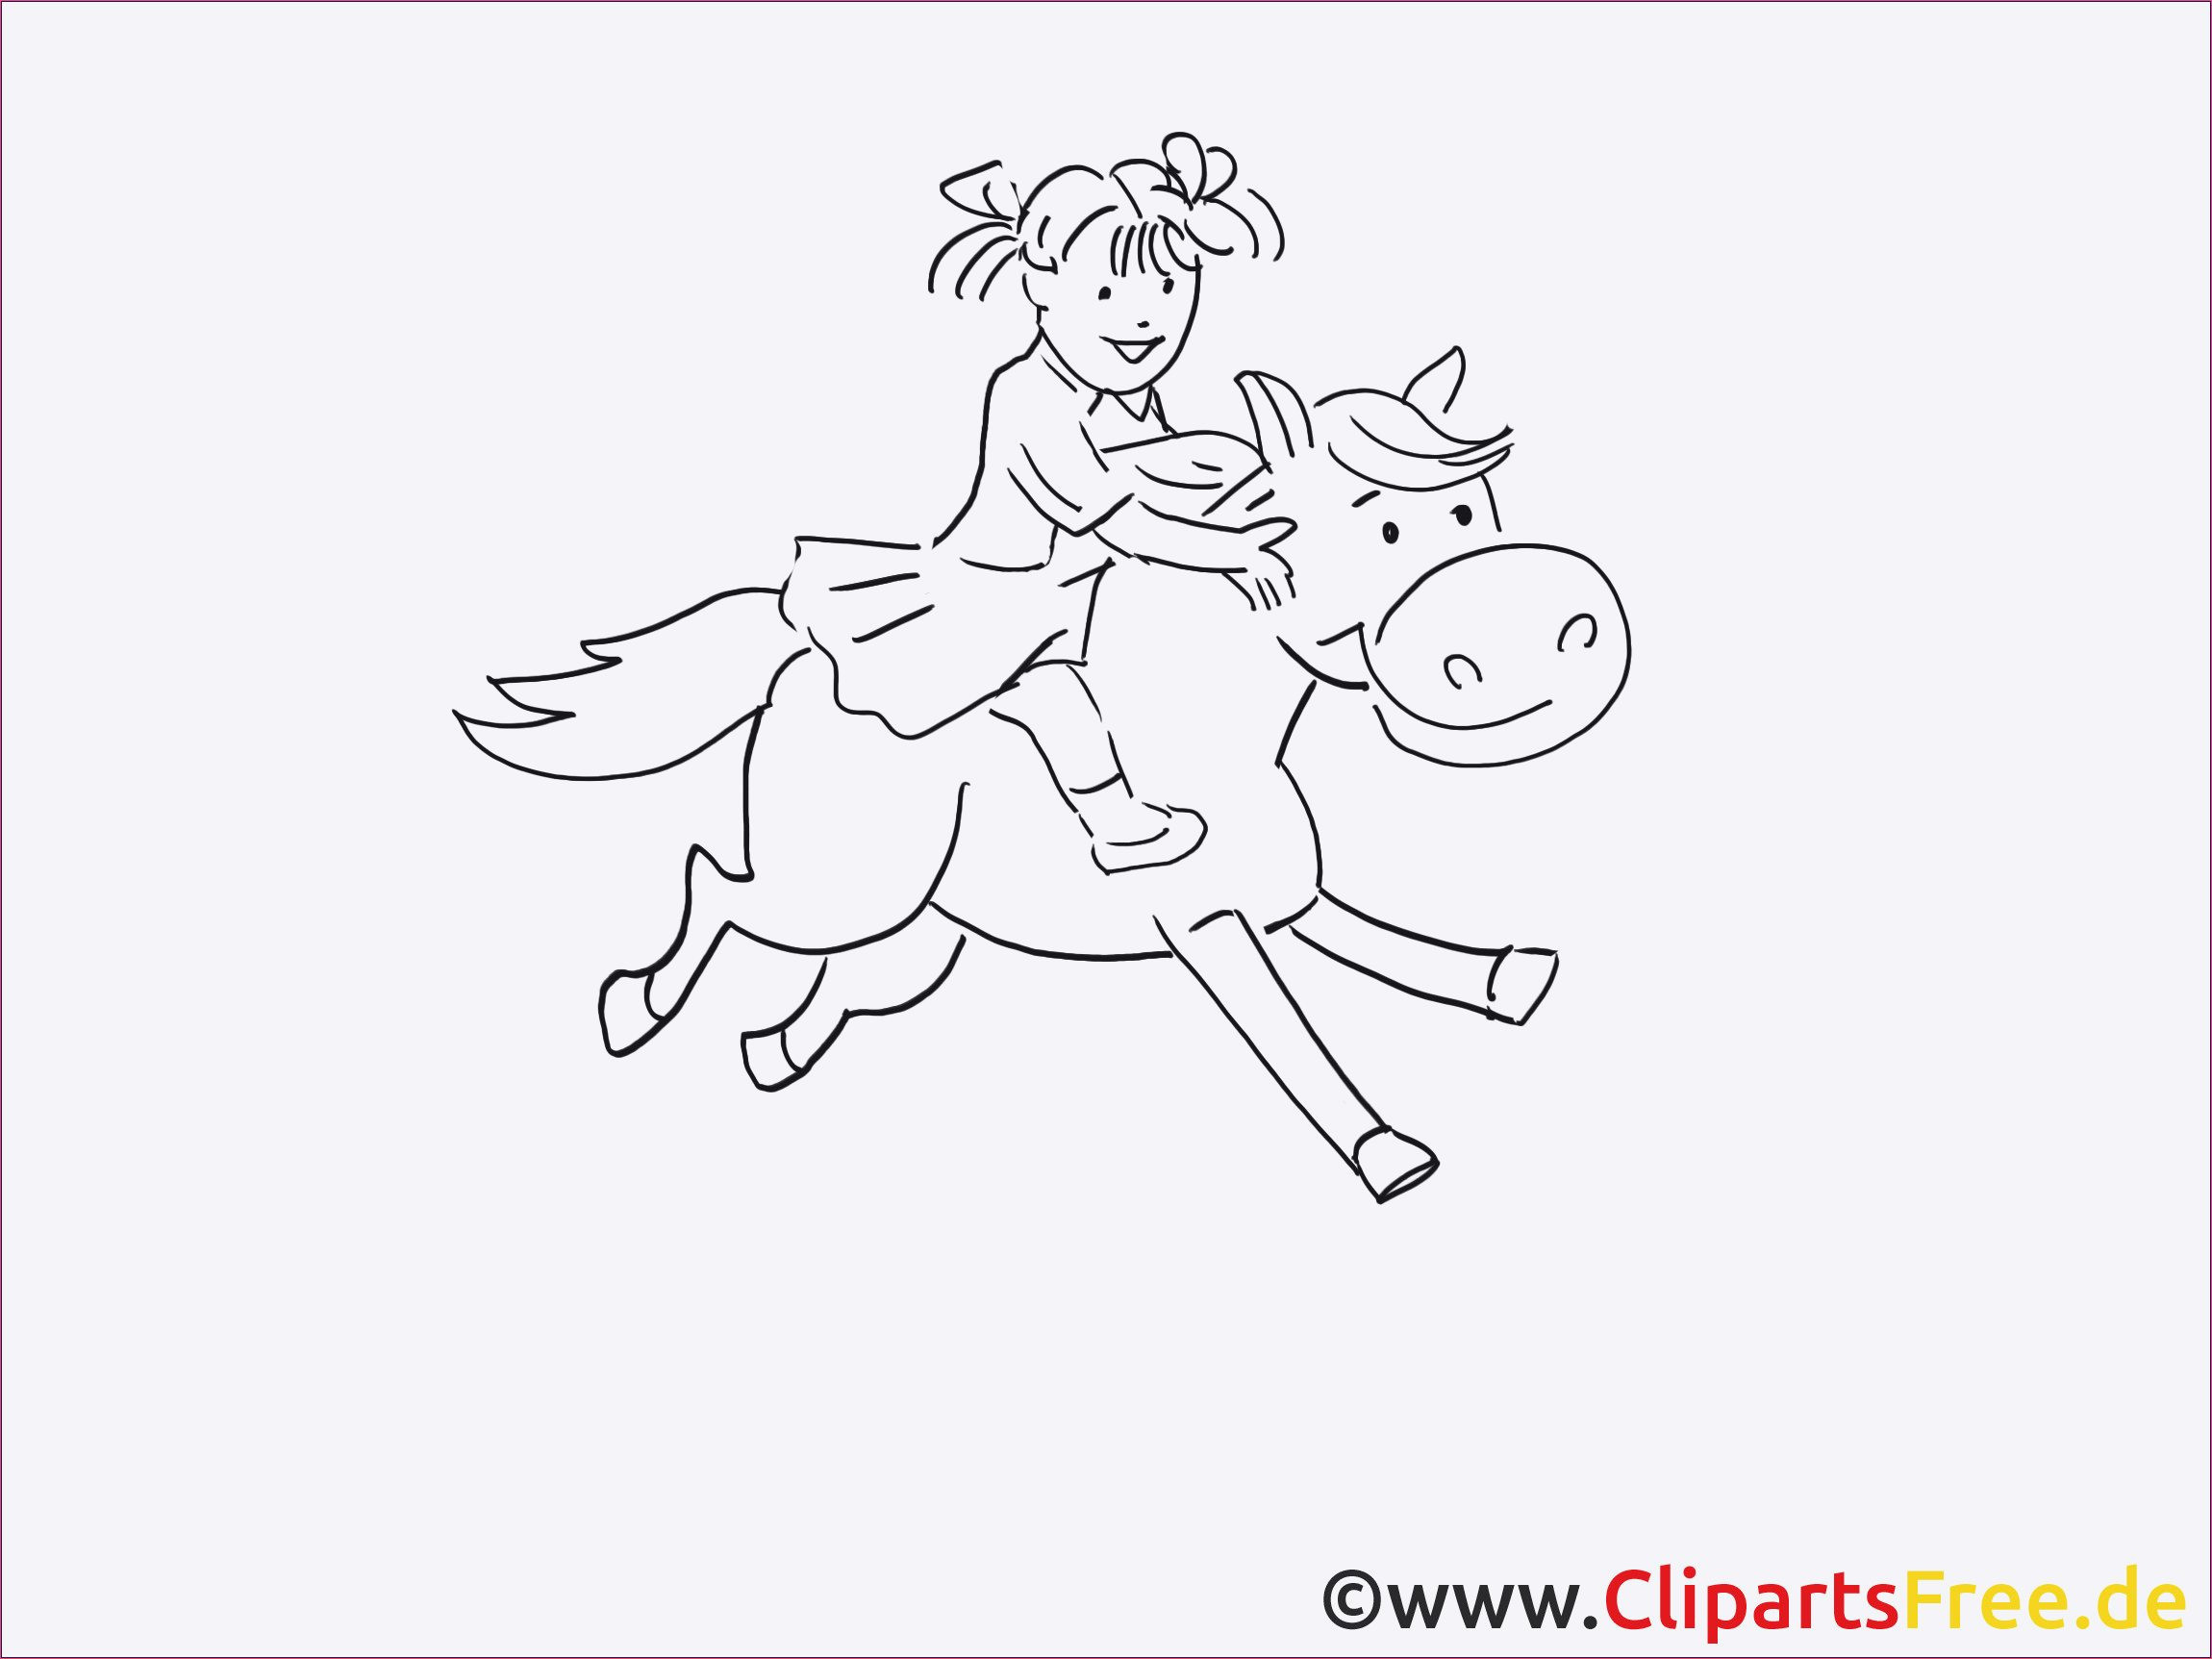 Soy Luna Ausmalbilder Neu Ausmalbilder Pferde Mit Madchen Genial Luna Ausmalbilder Bilder